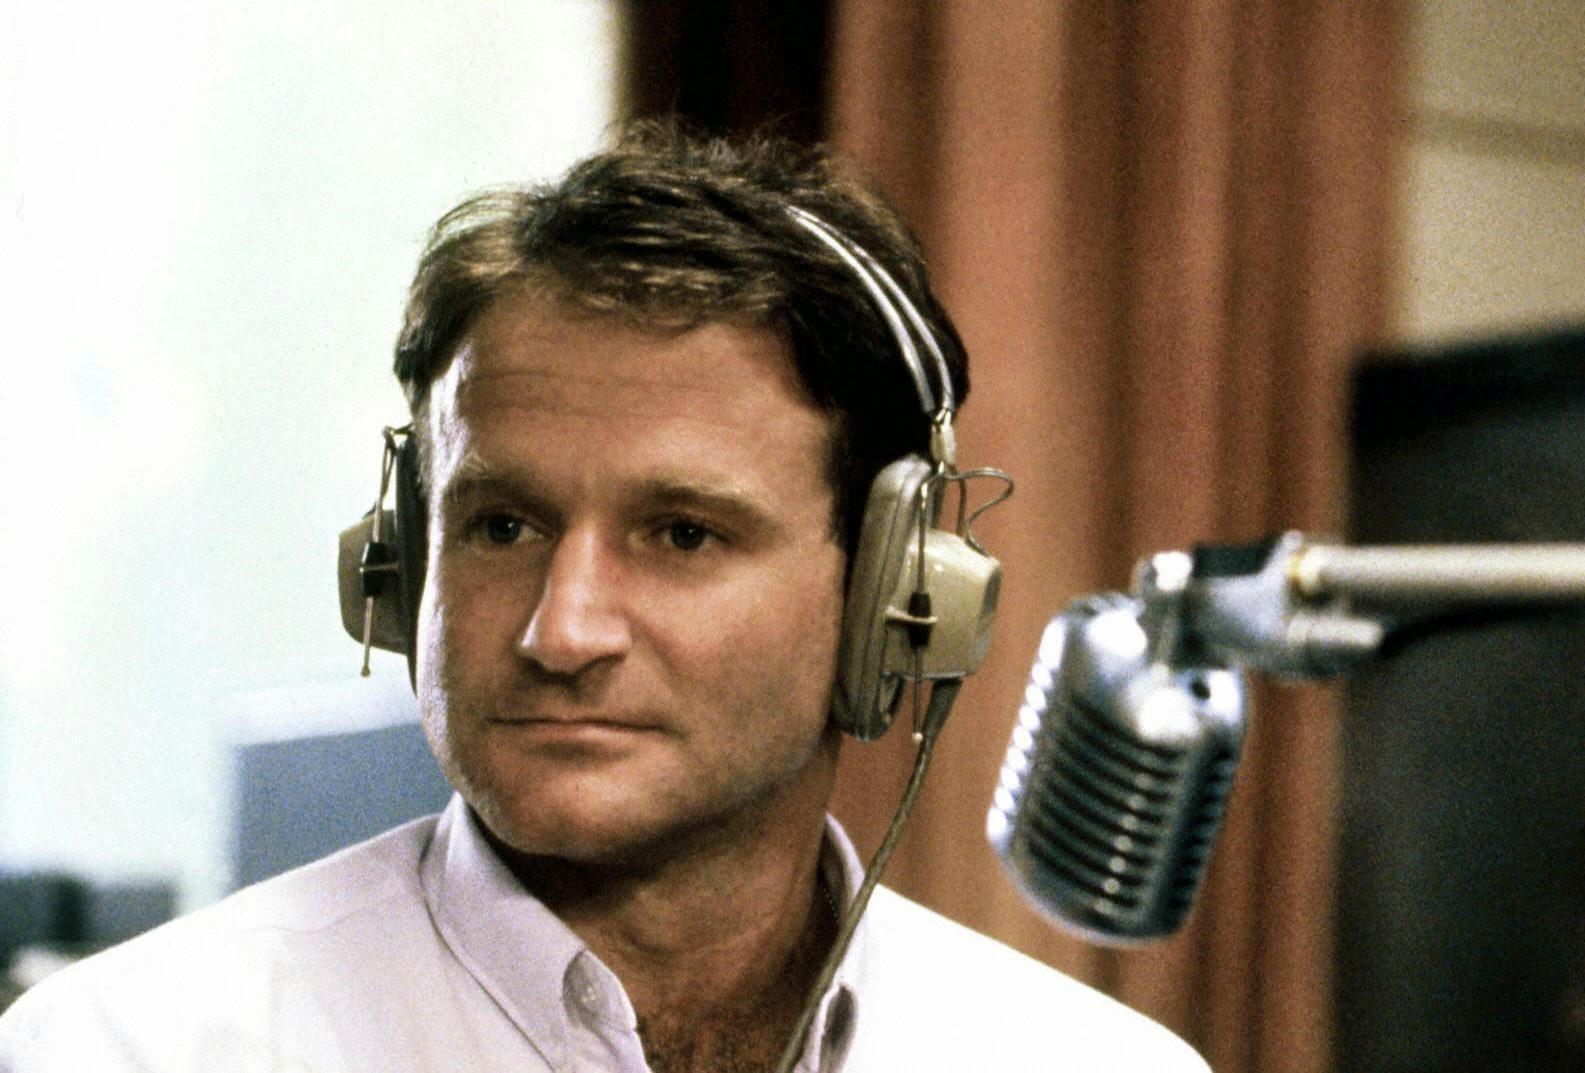 Robin Williams, Good morning Vietnam, celebrity overdoses,